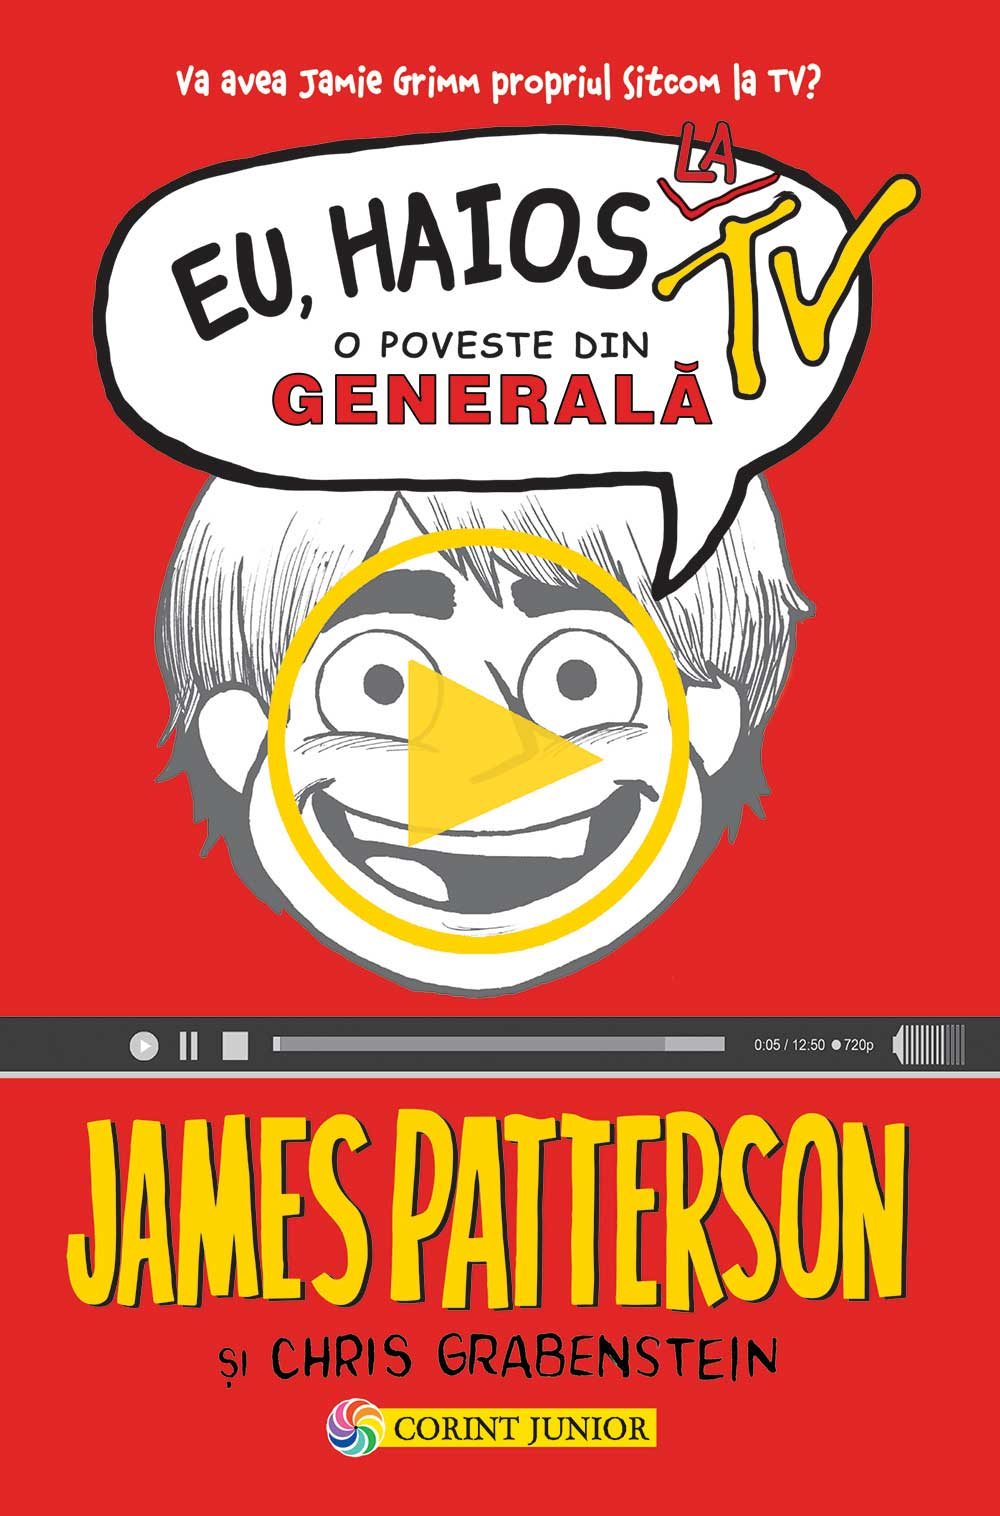 Eu-haios-la-TV-Patterson-carti-copii-editura-corint-junior